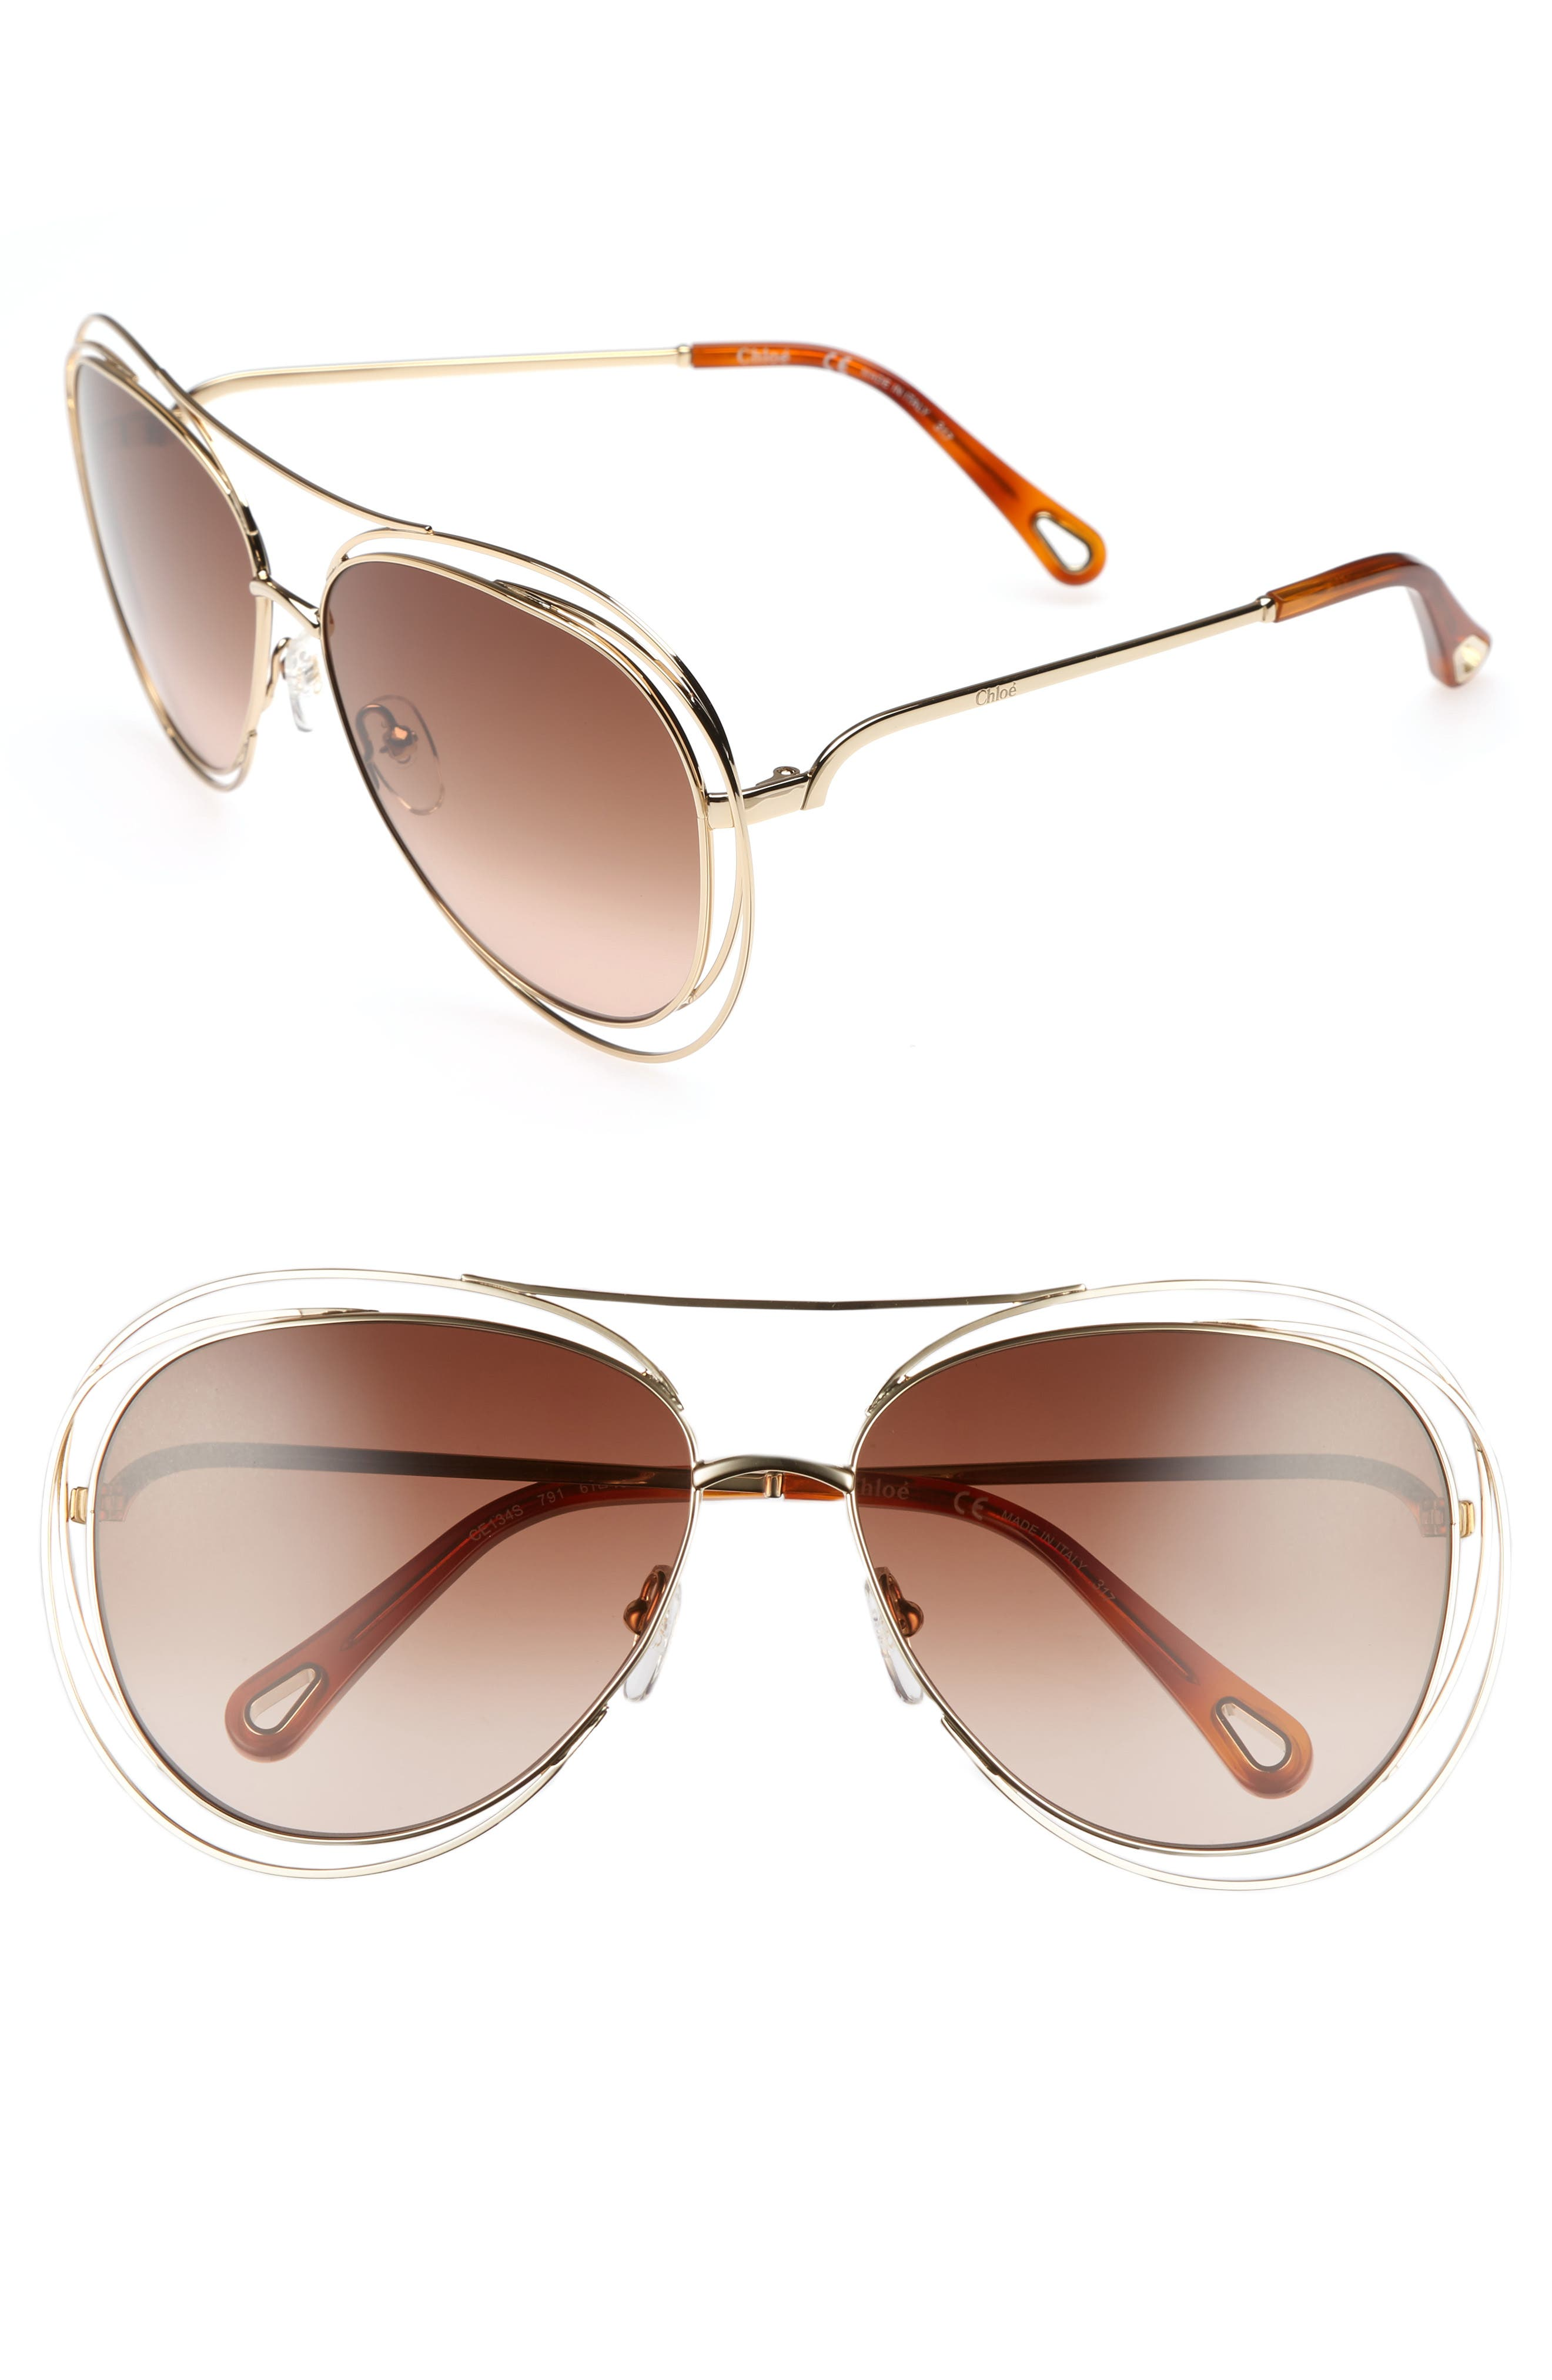 Main Image - Chloé 61mm Aviator Sunglasses